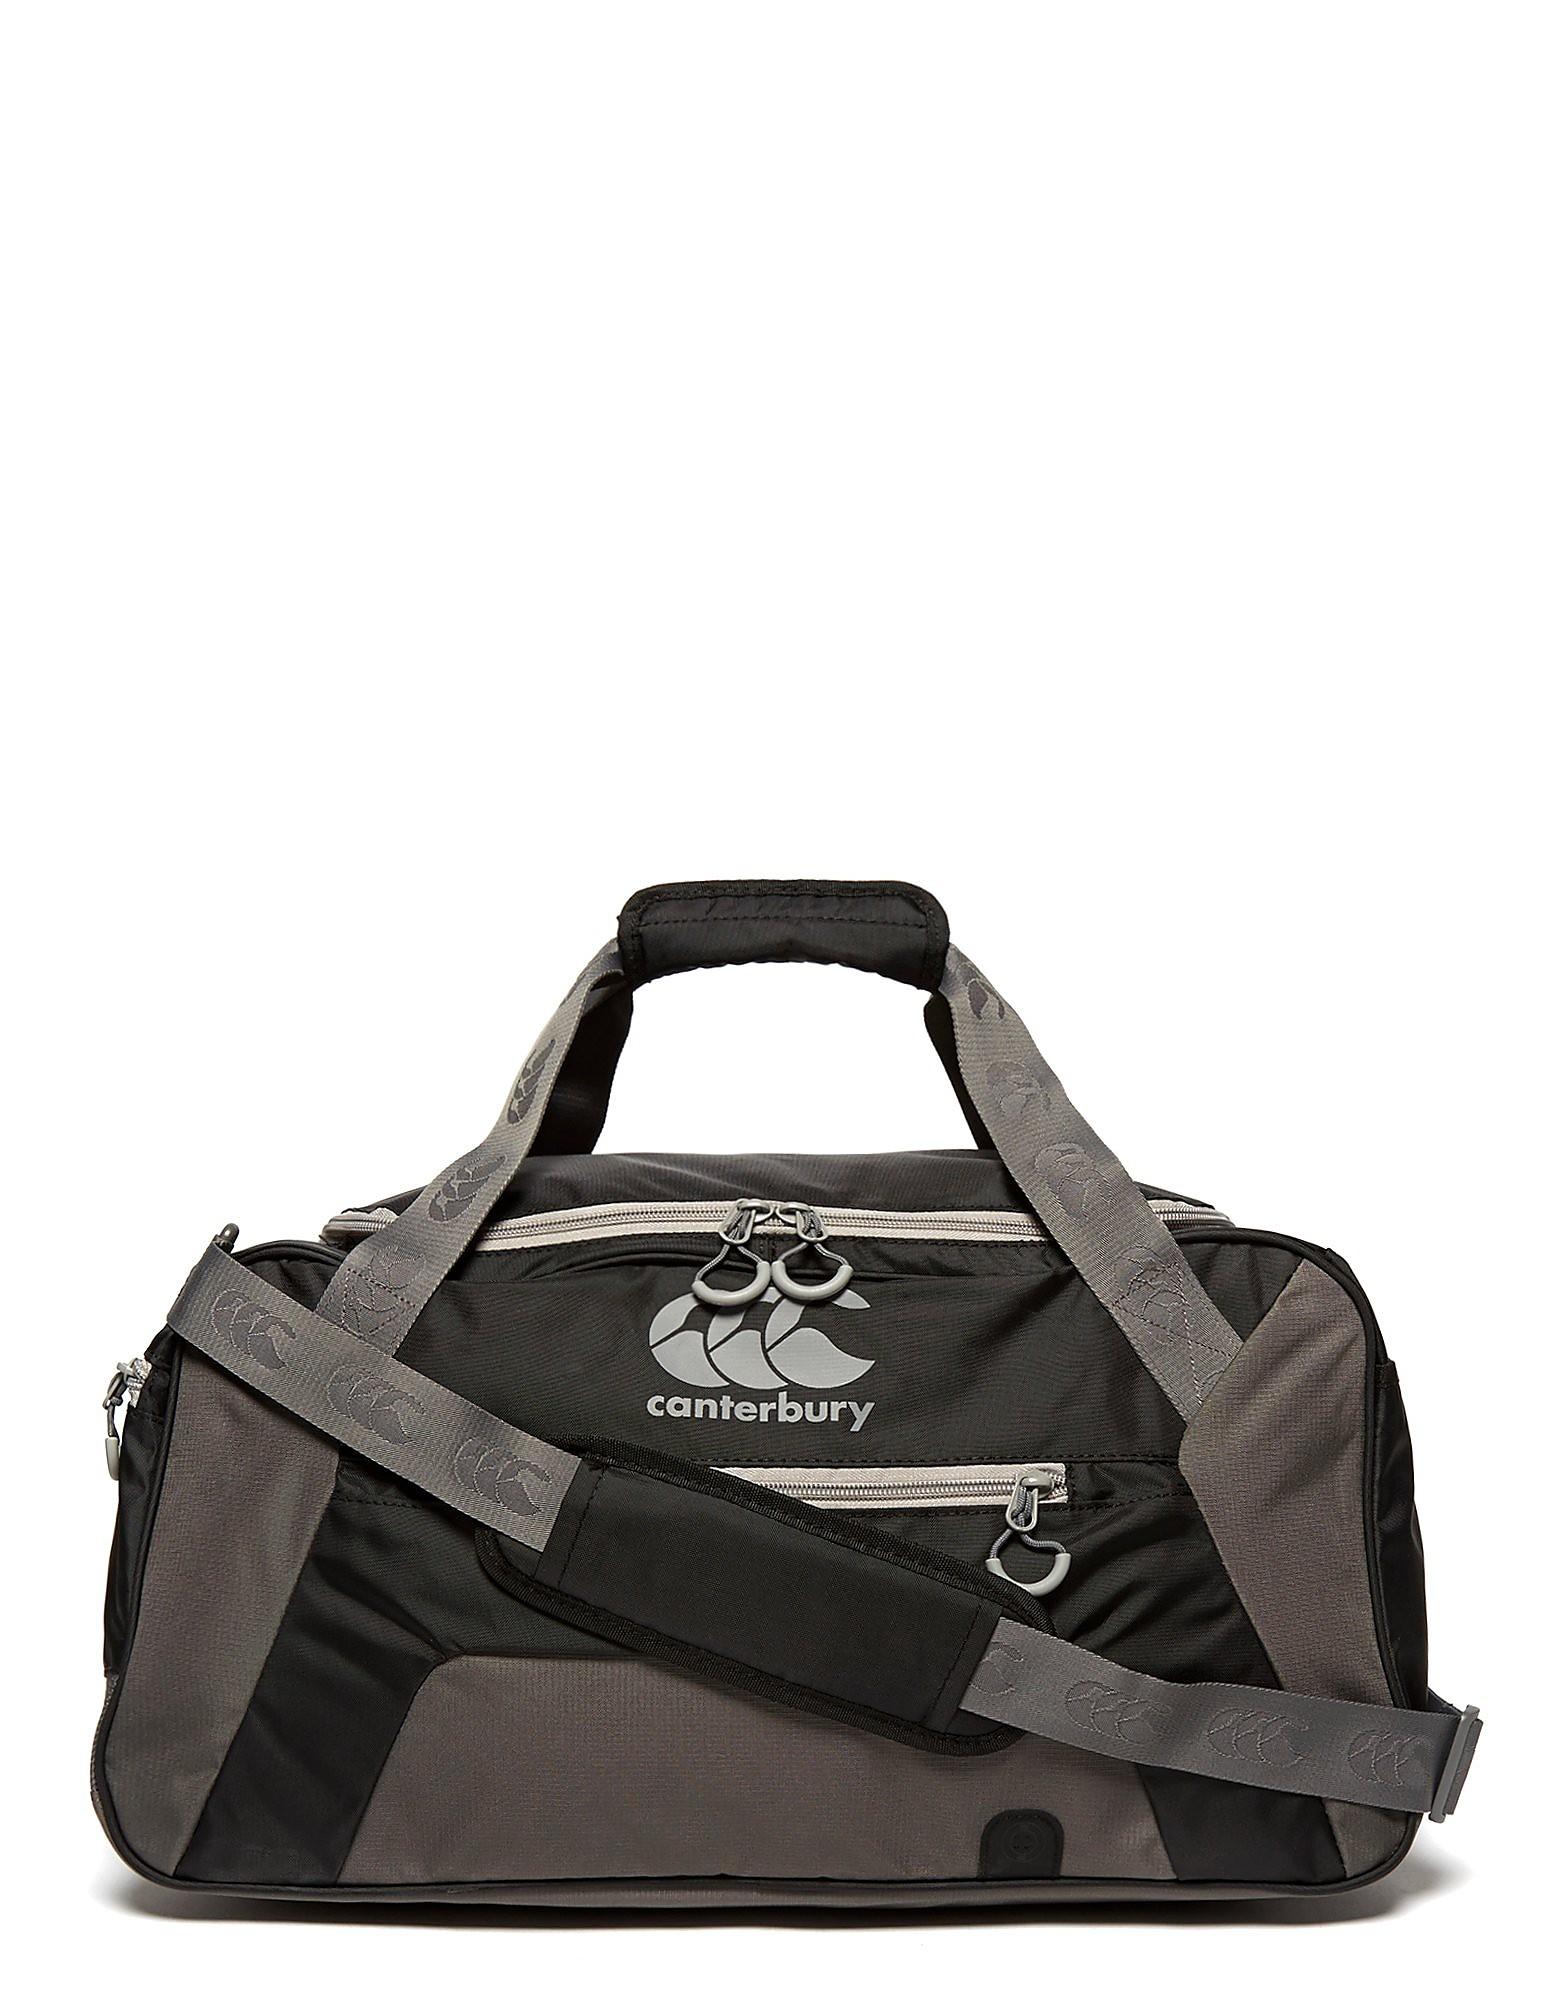 Canterbury Medium Holdall Bag